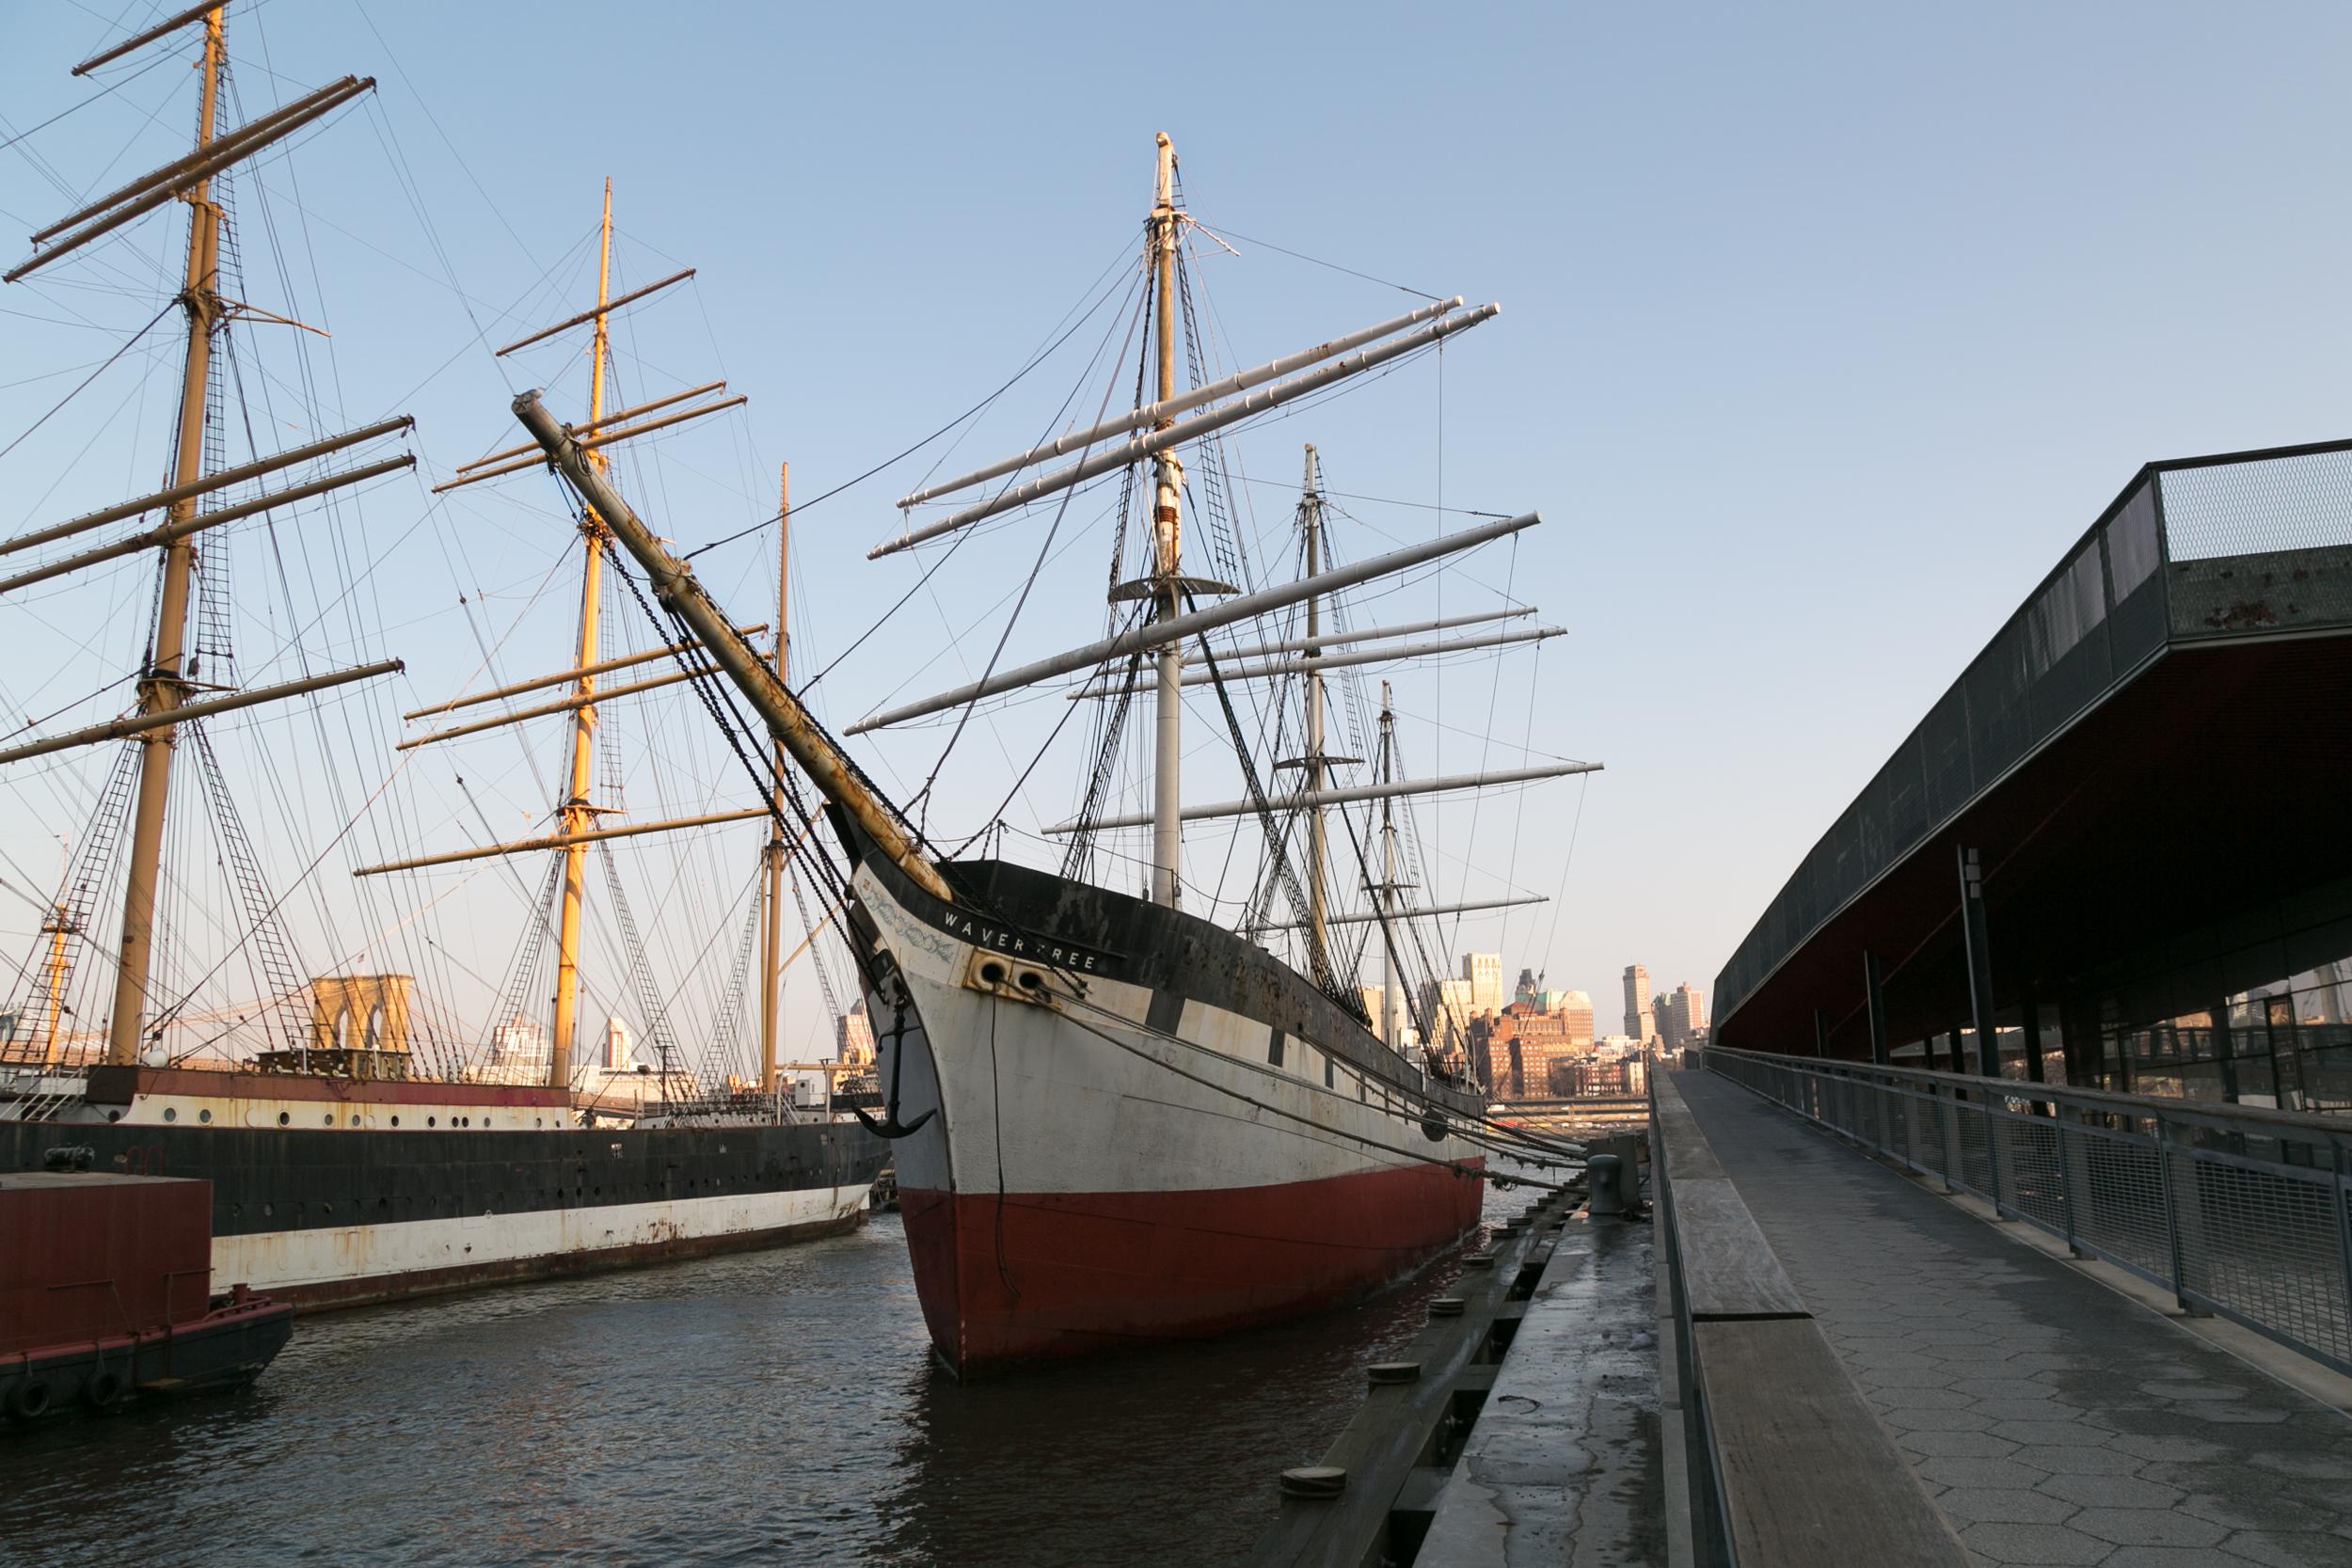 6_Pier - Ships.jpg